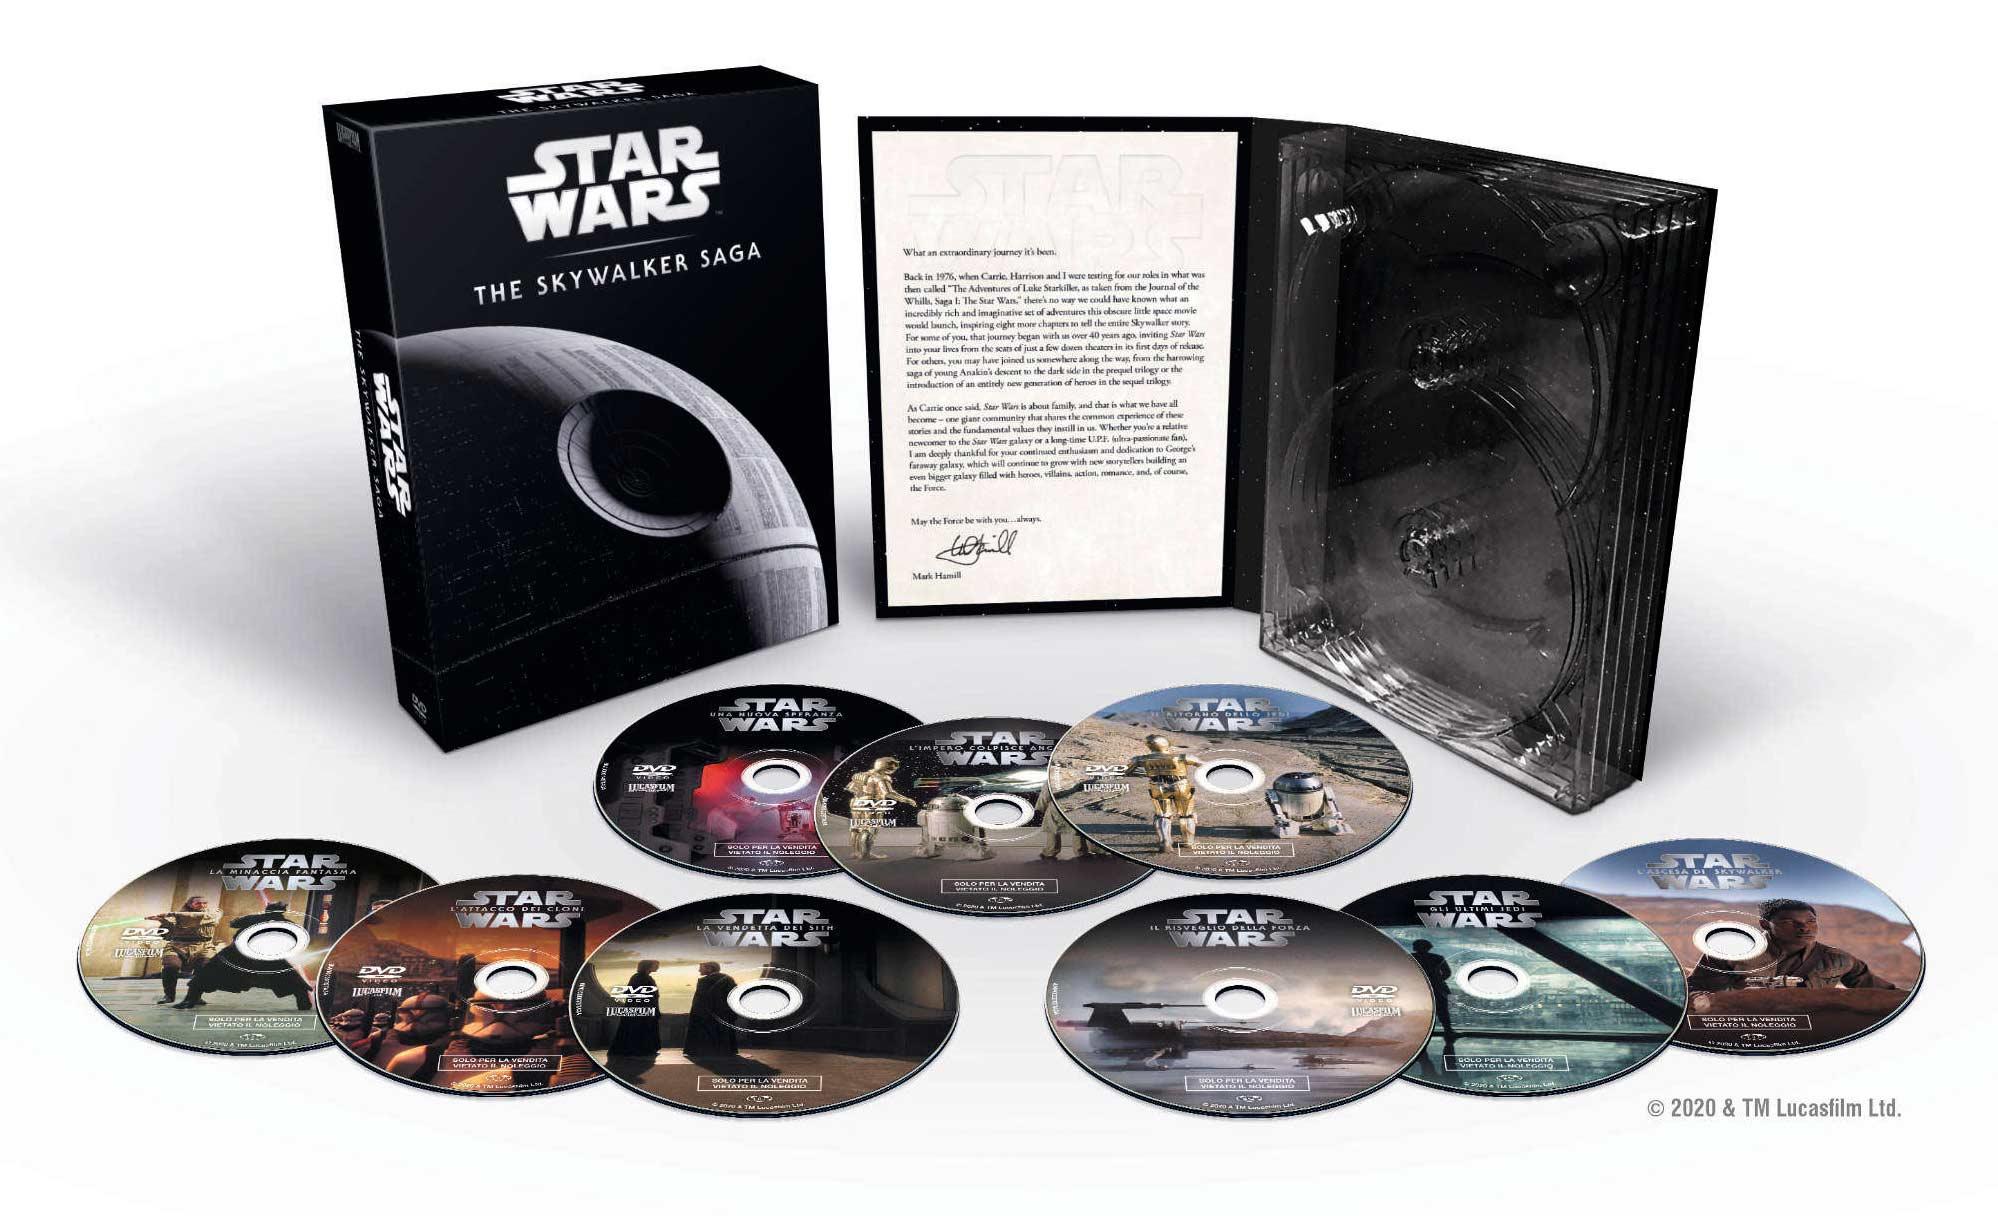 COF.STAR WARS - MOVIE COLLECTION I-IX (LTD) (9 DVD) (DVD)